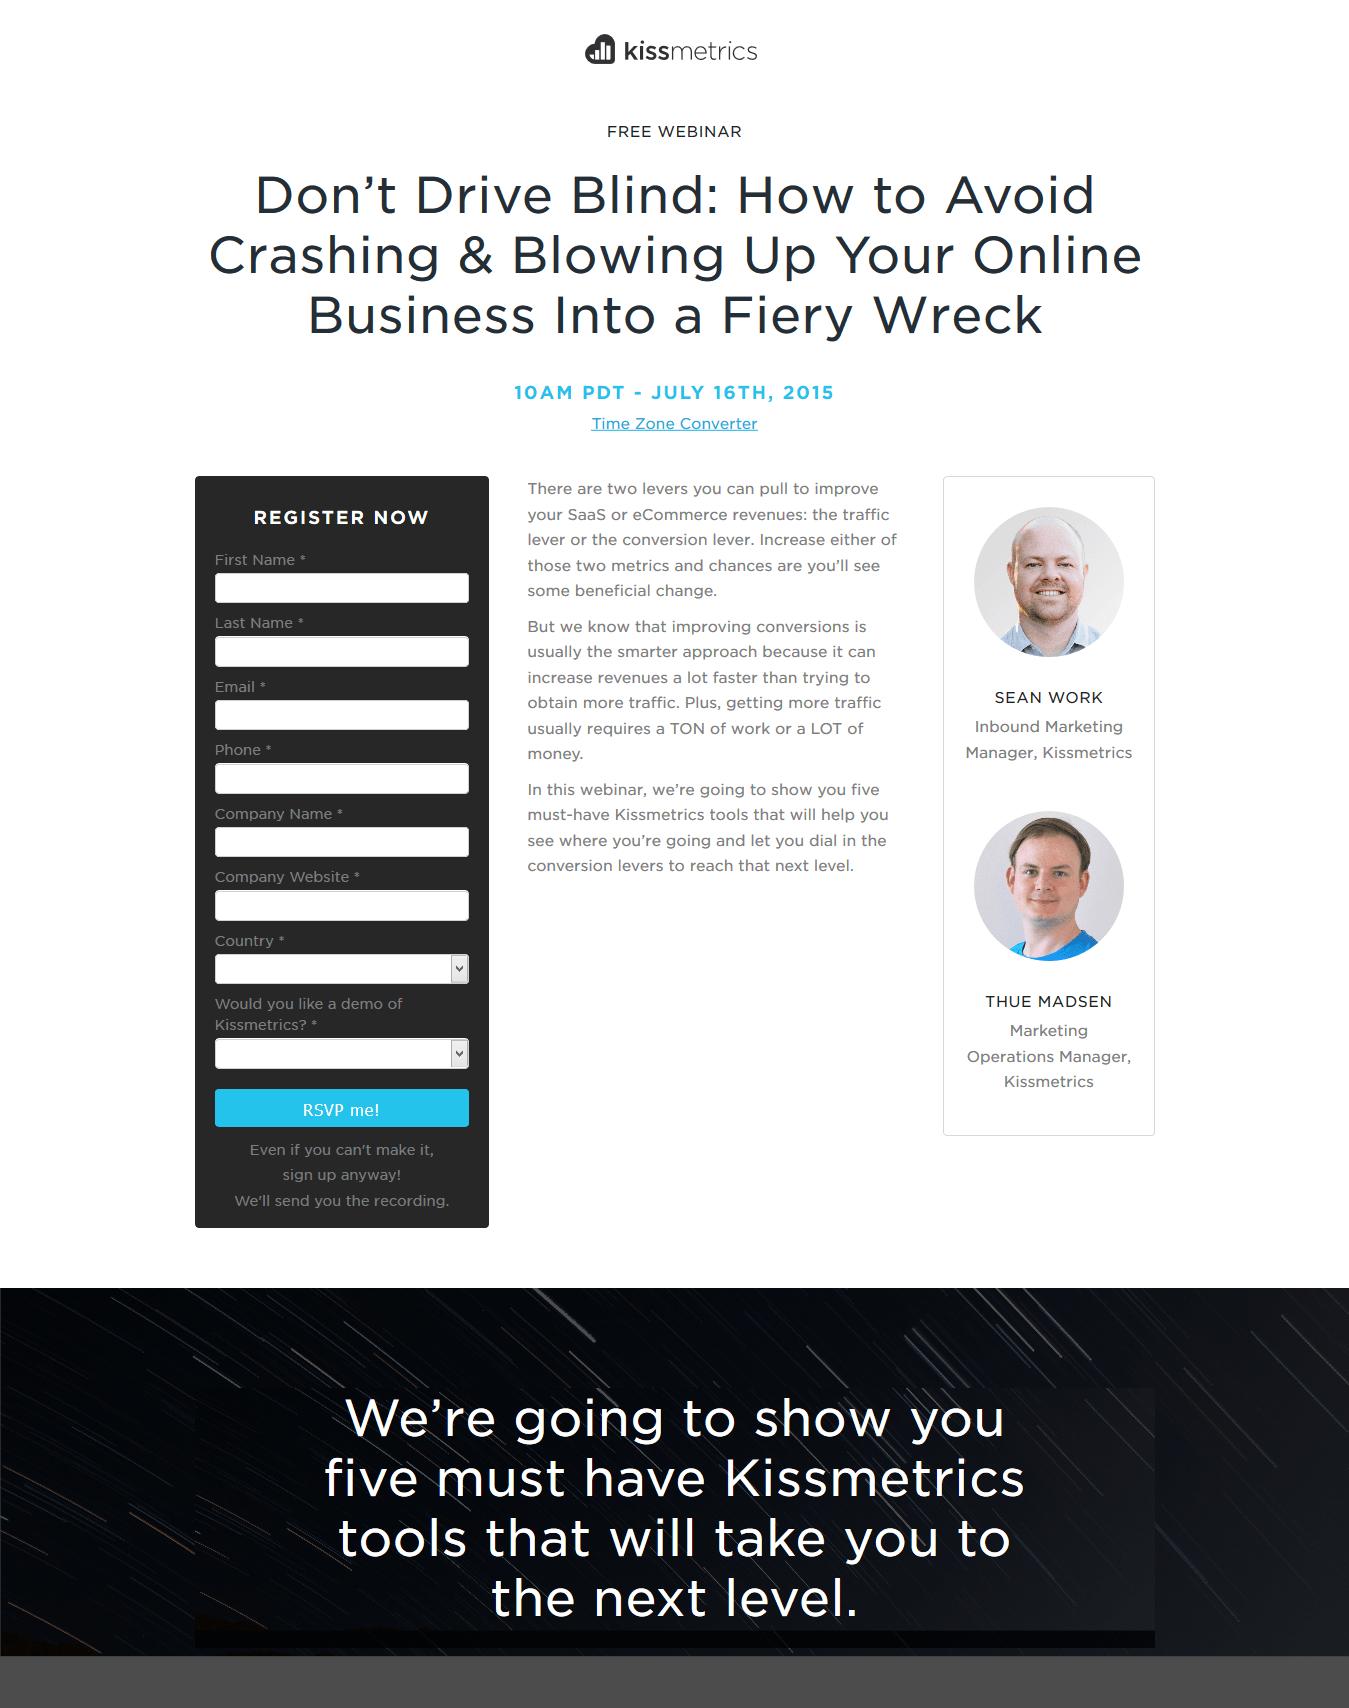 Kissmetrics shows how to use presenter headshots and photography on its webinar landing page.